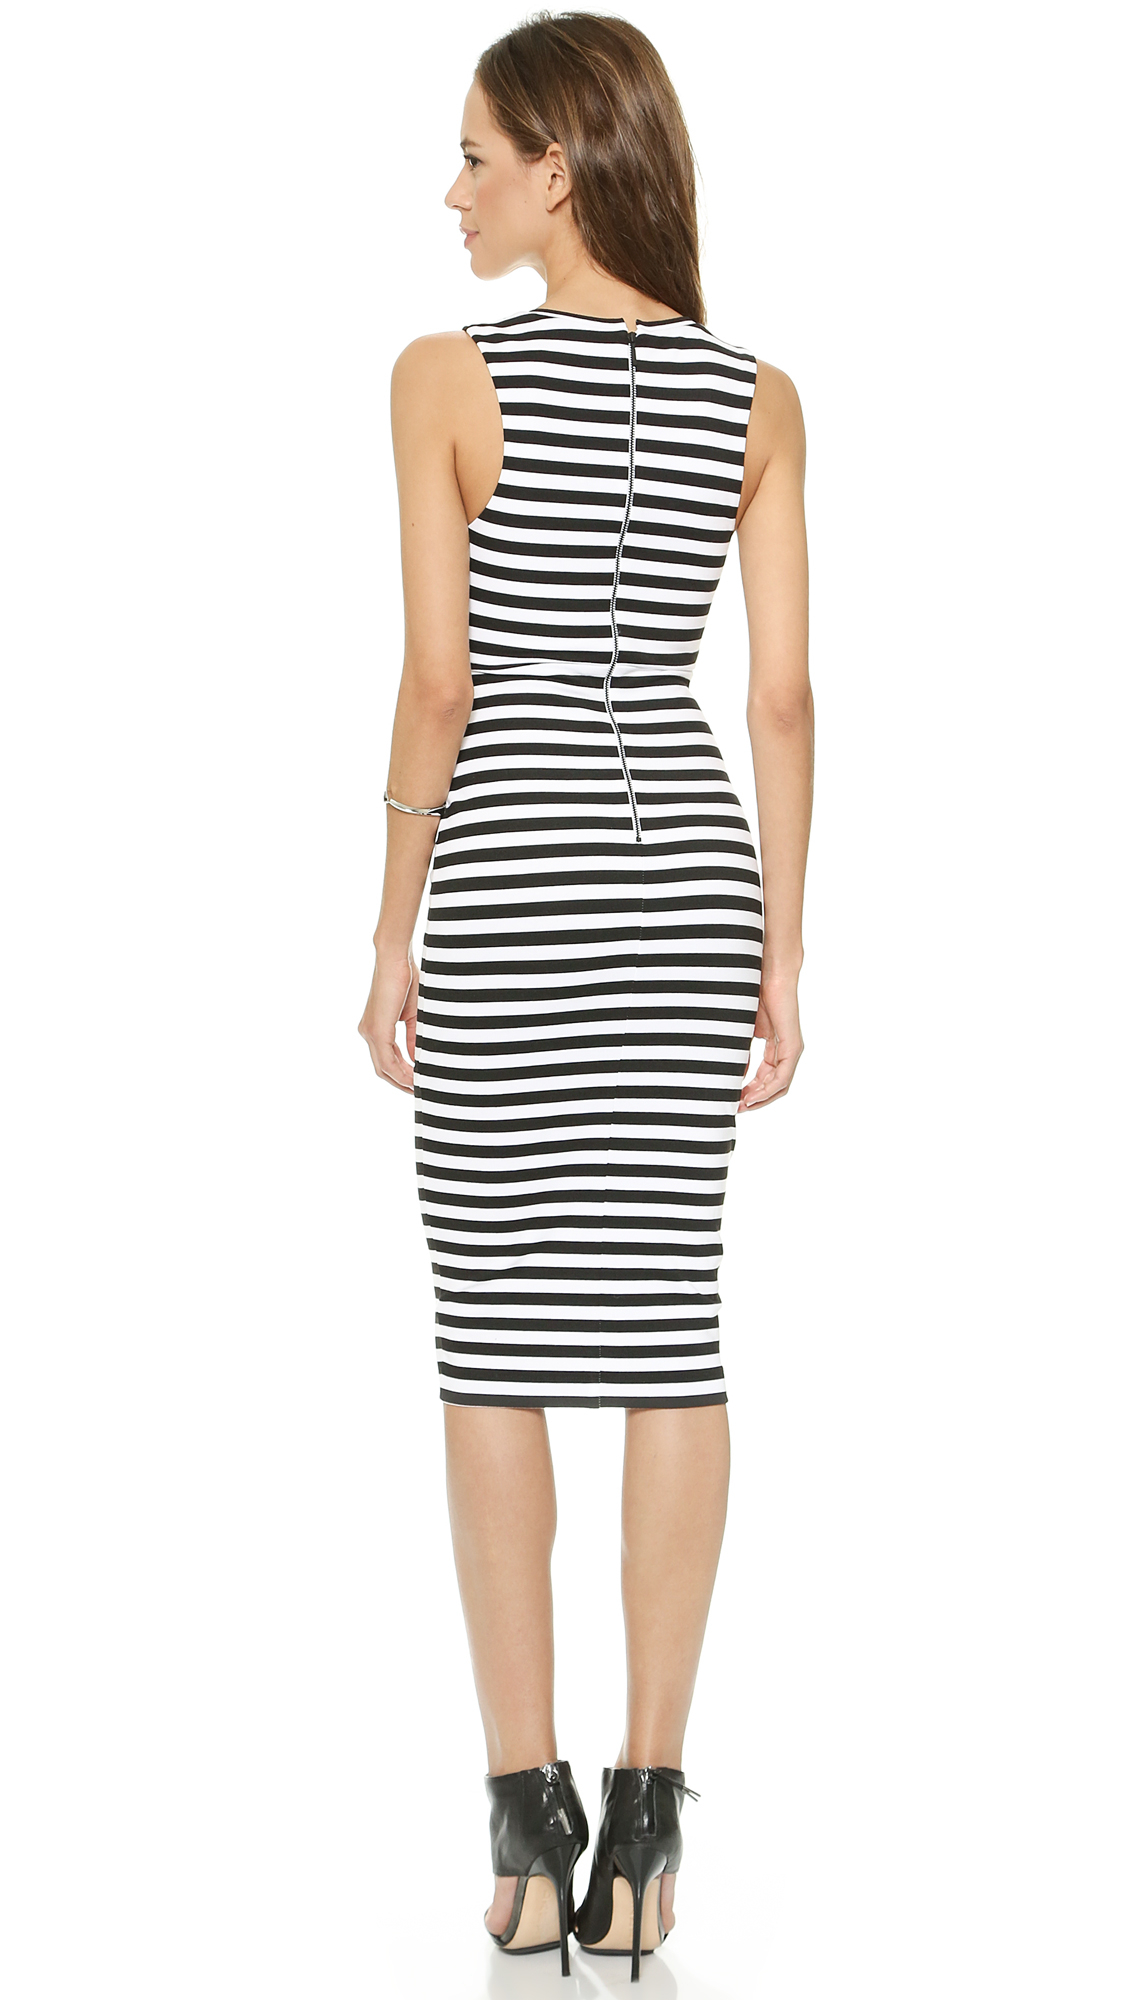 f5650f2e0652 Bec & Bridge Seven Wonders Deep V Dress - Stripe in Black - Lyst